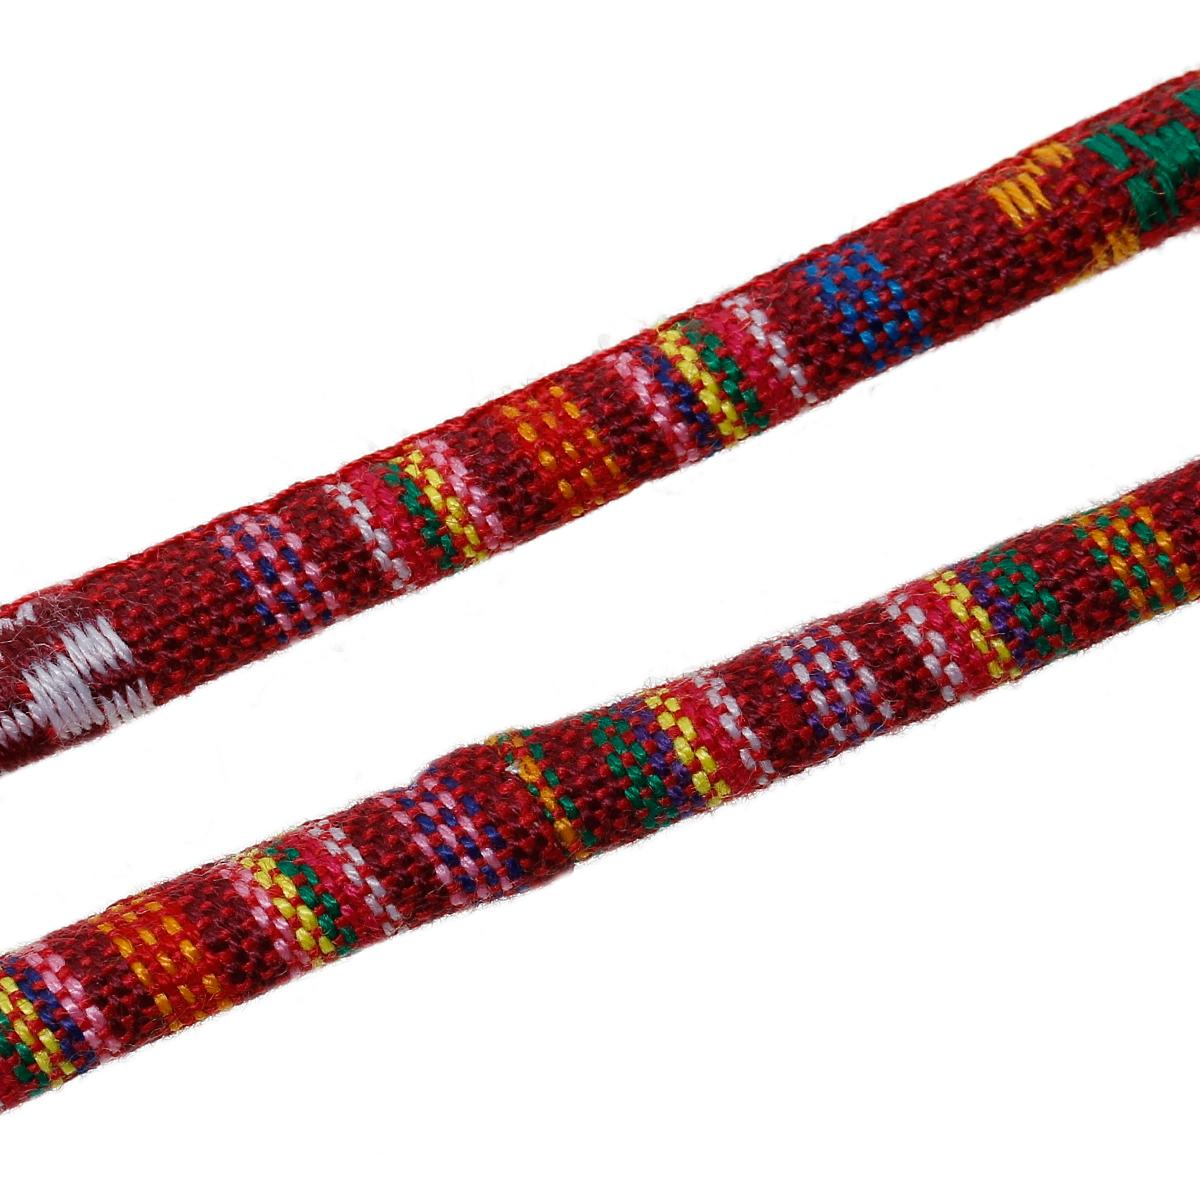 Un mètre de cordon en coton fantaisie rond de type ethnique